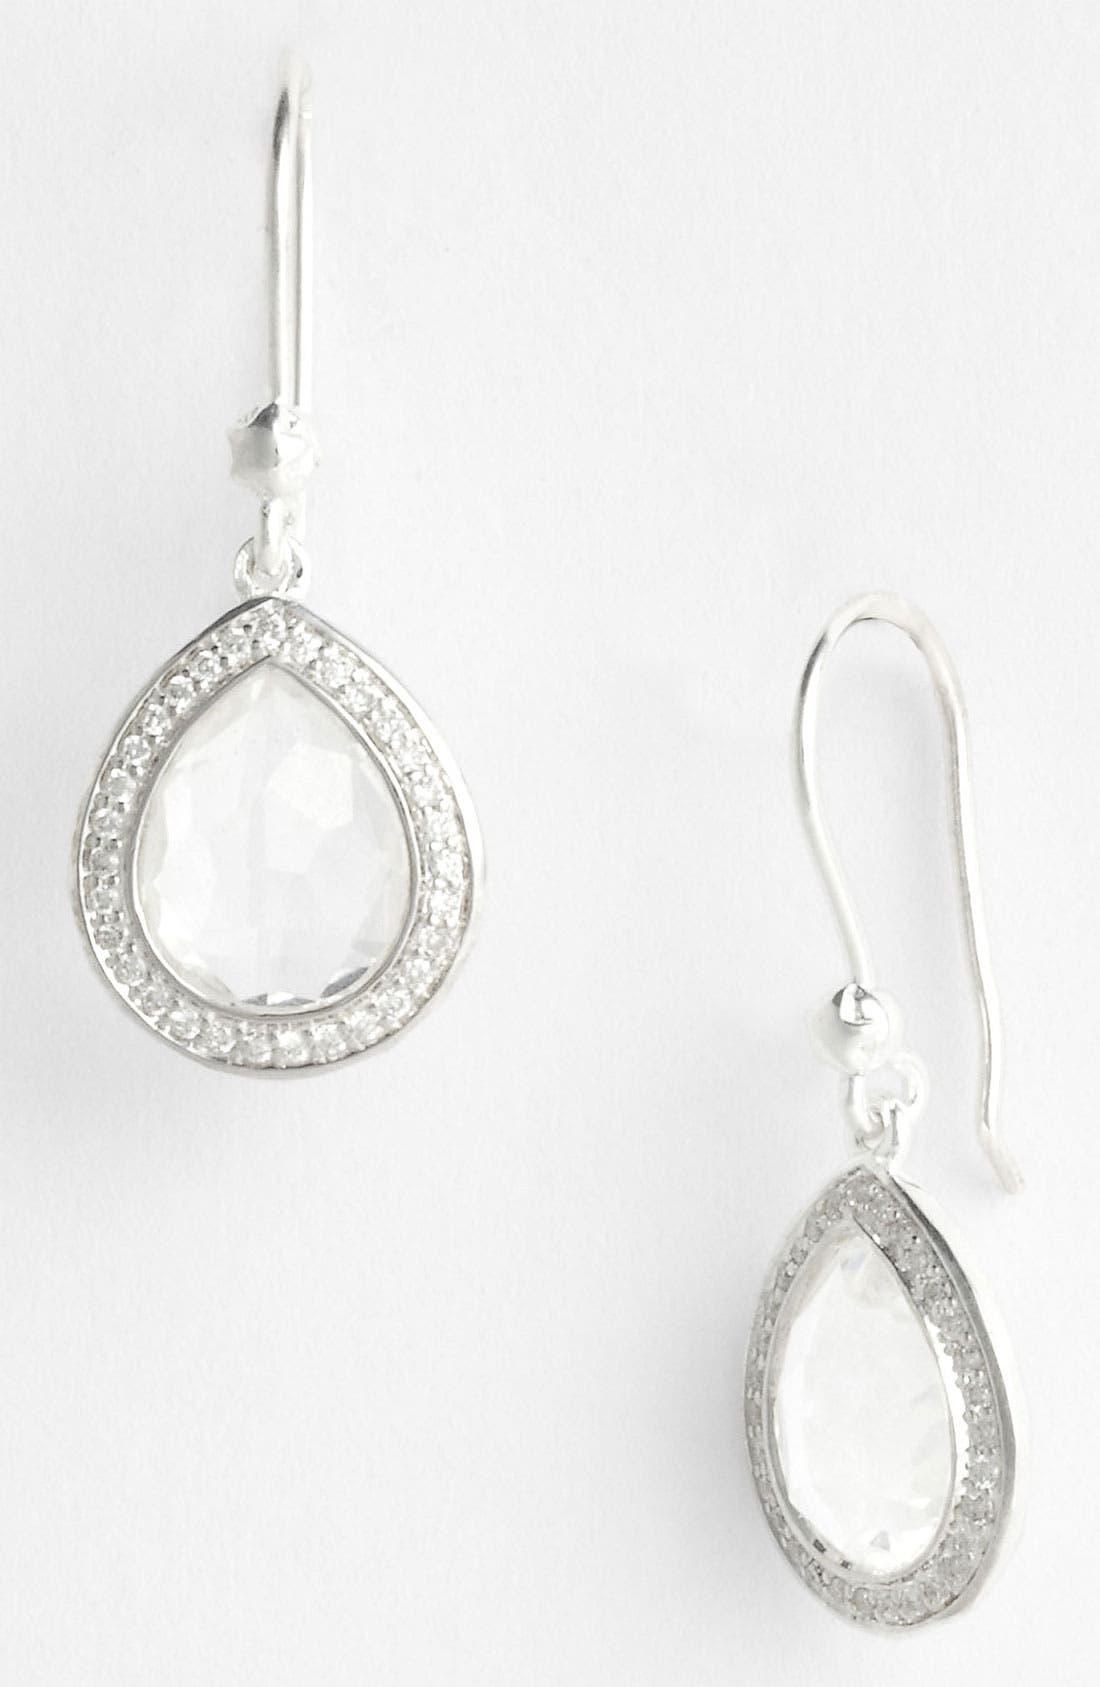 'Stella' Small Teardrop Earrings,                             Main thumbnail 1, color,                             040